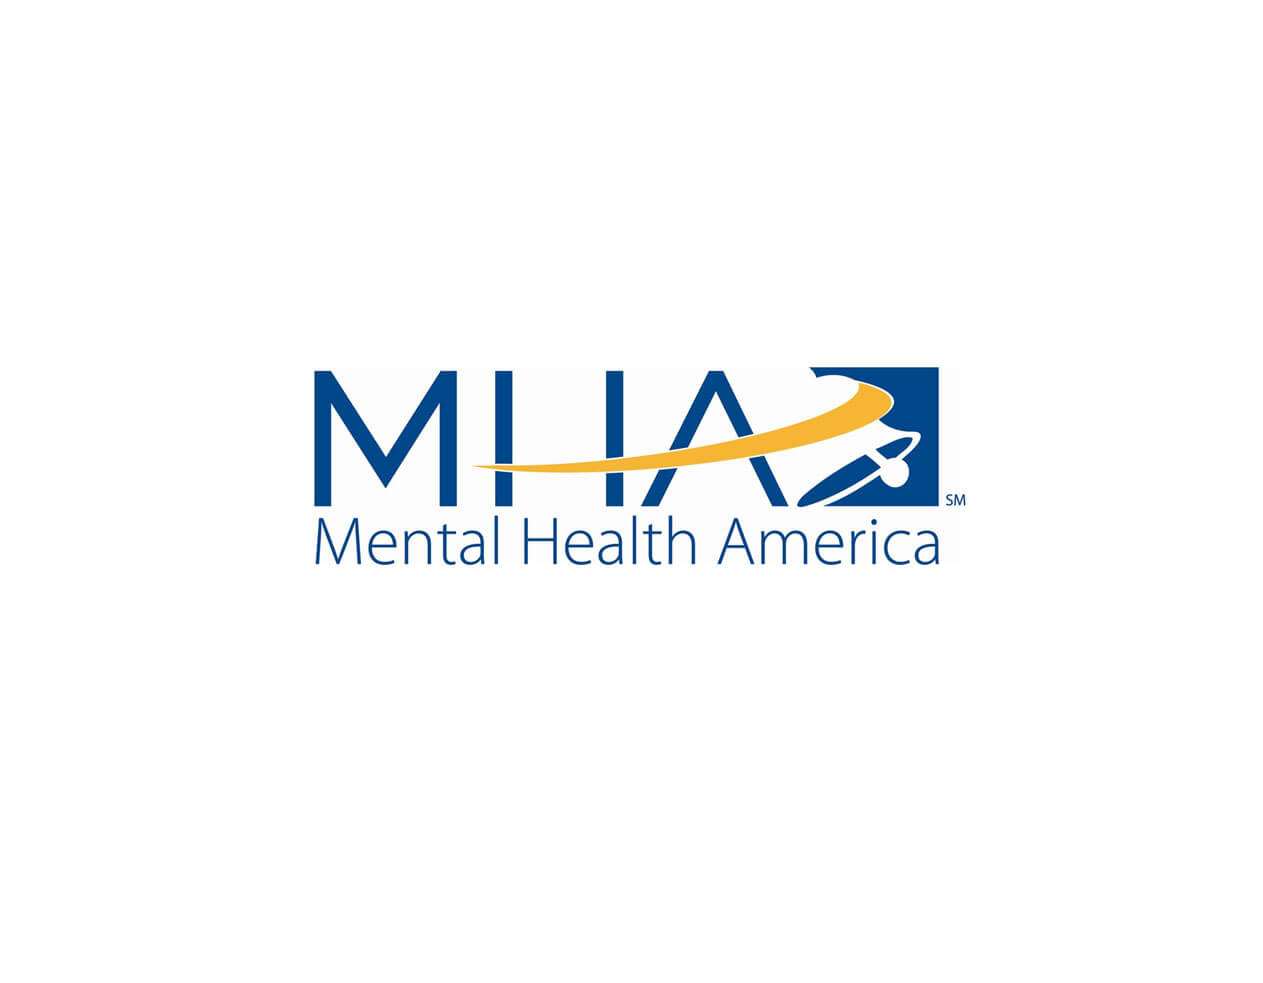 MENTAL HEALTH AMERICA.jpg